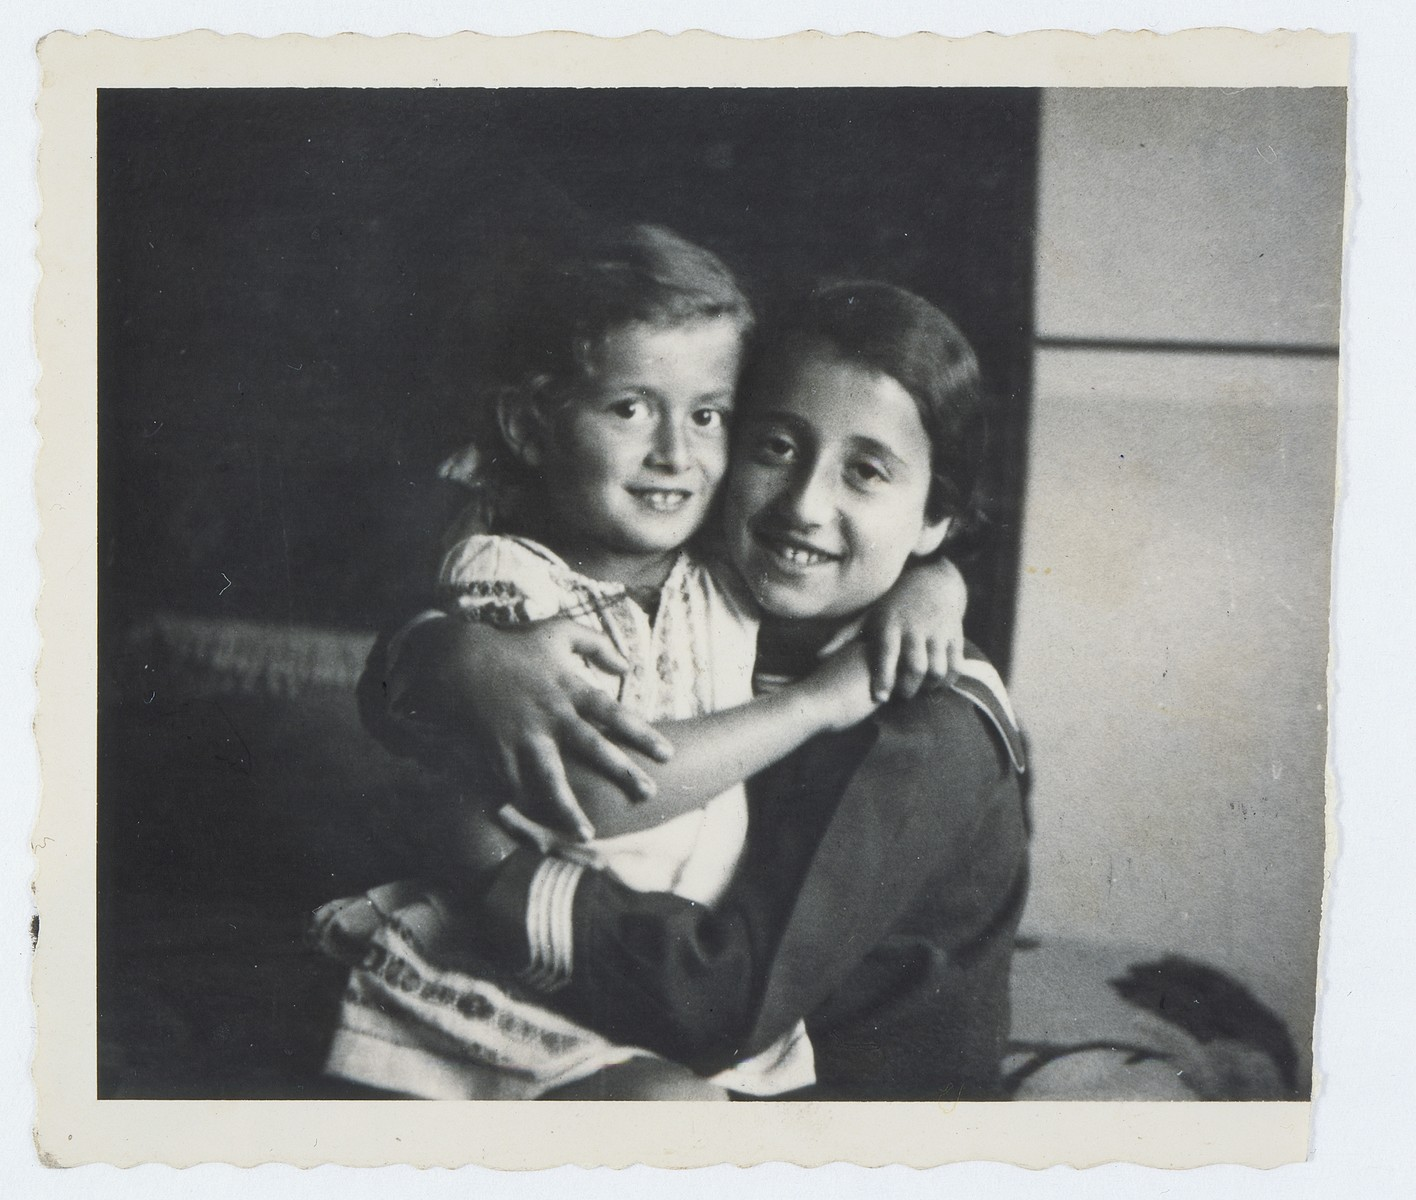 Lida Kleinman hugs an older girl, Ola Weinberger.